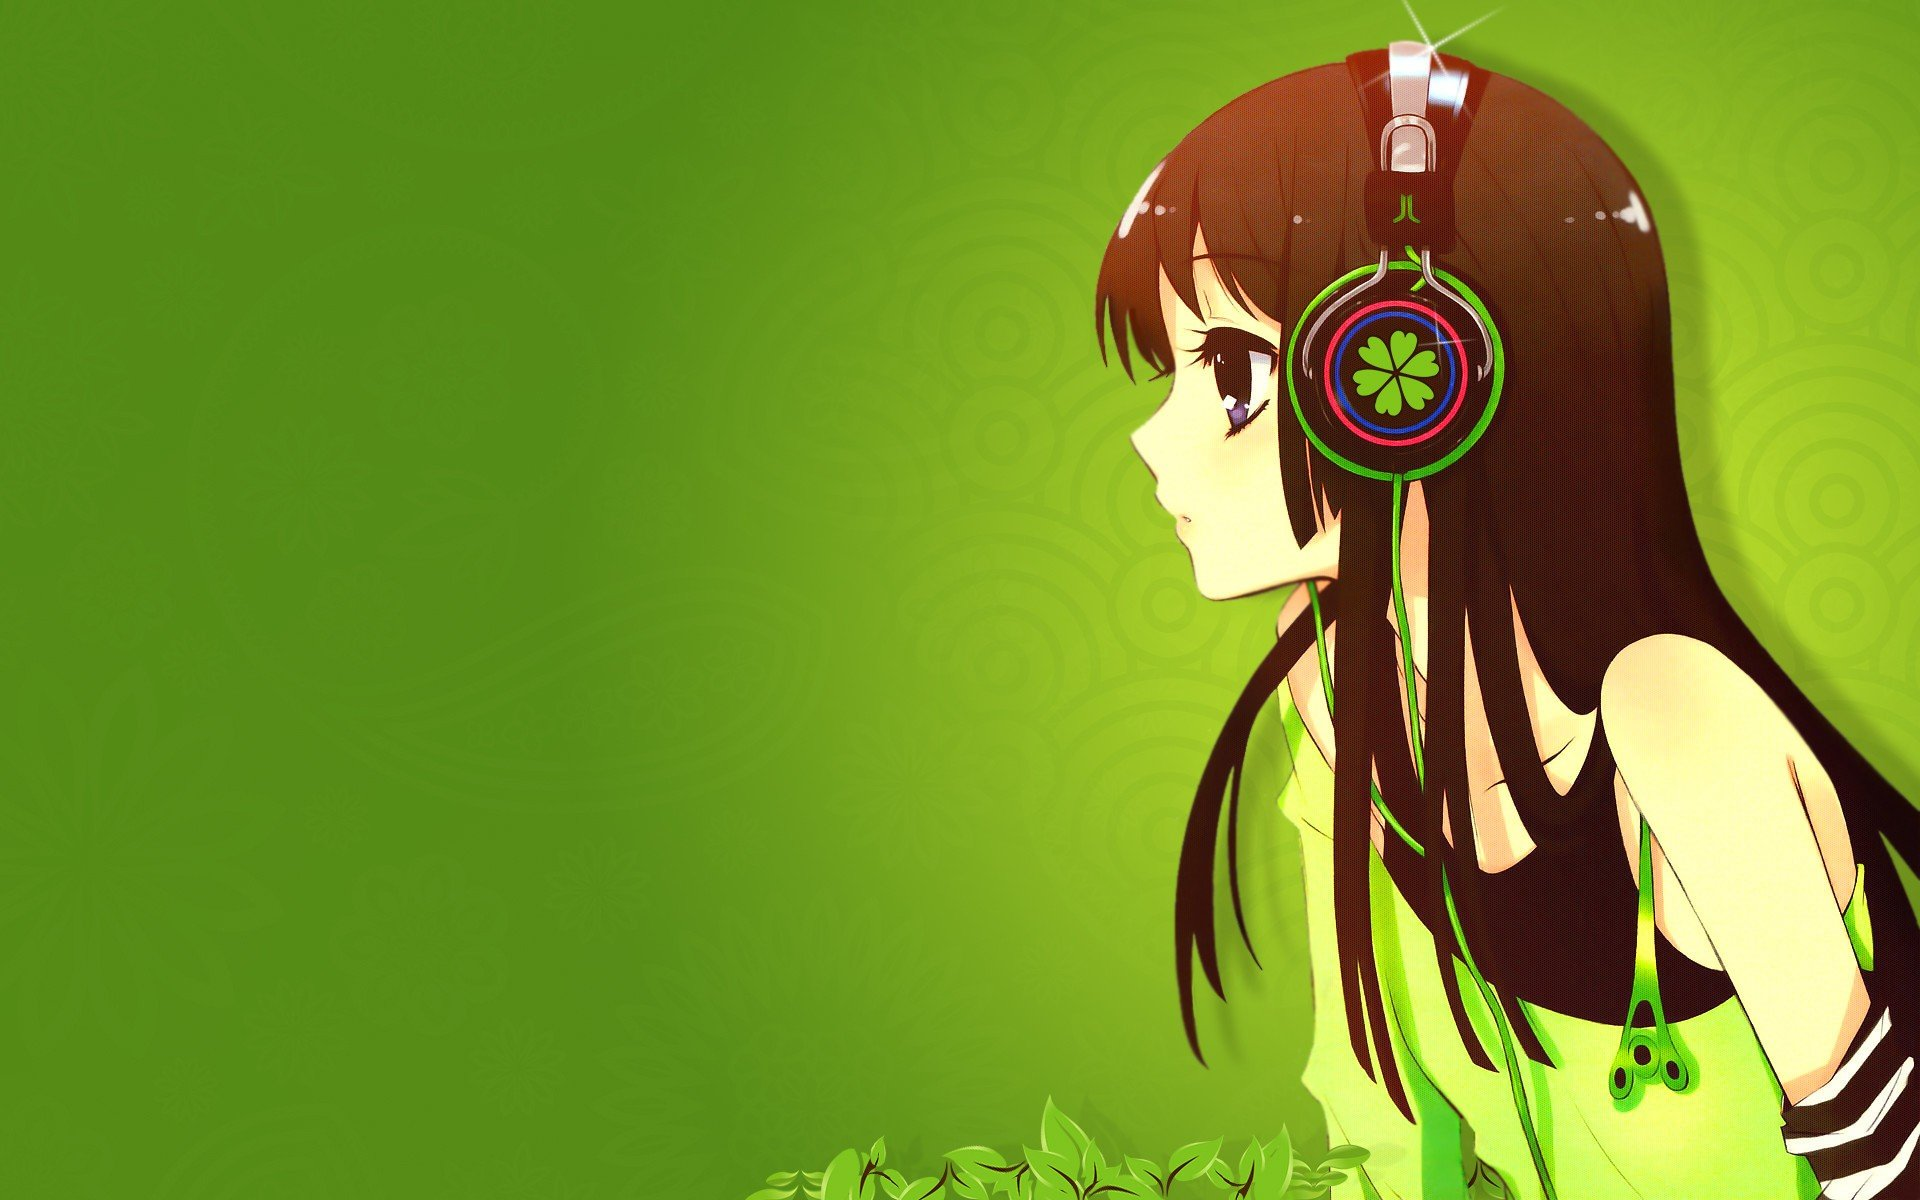 Download Wallpaper Cute Anime HD Desktop Wallpaper ...